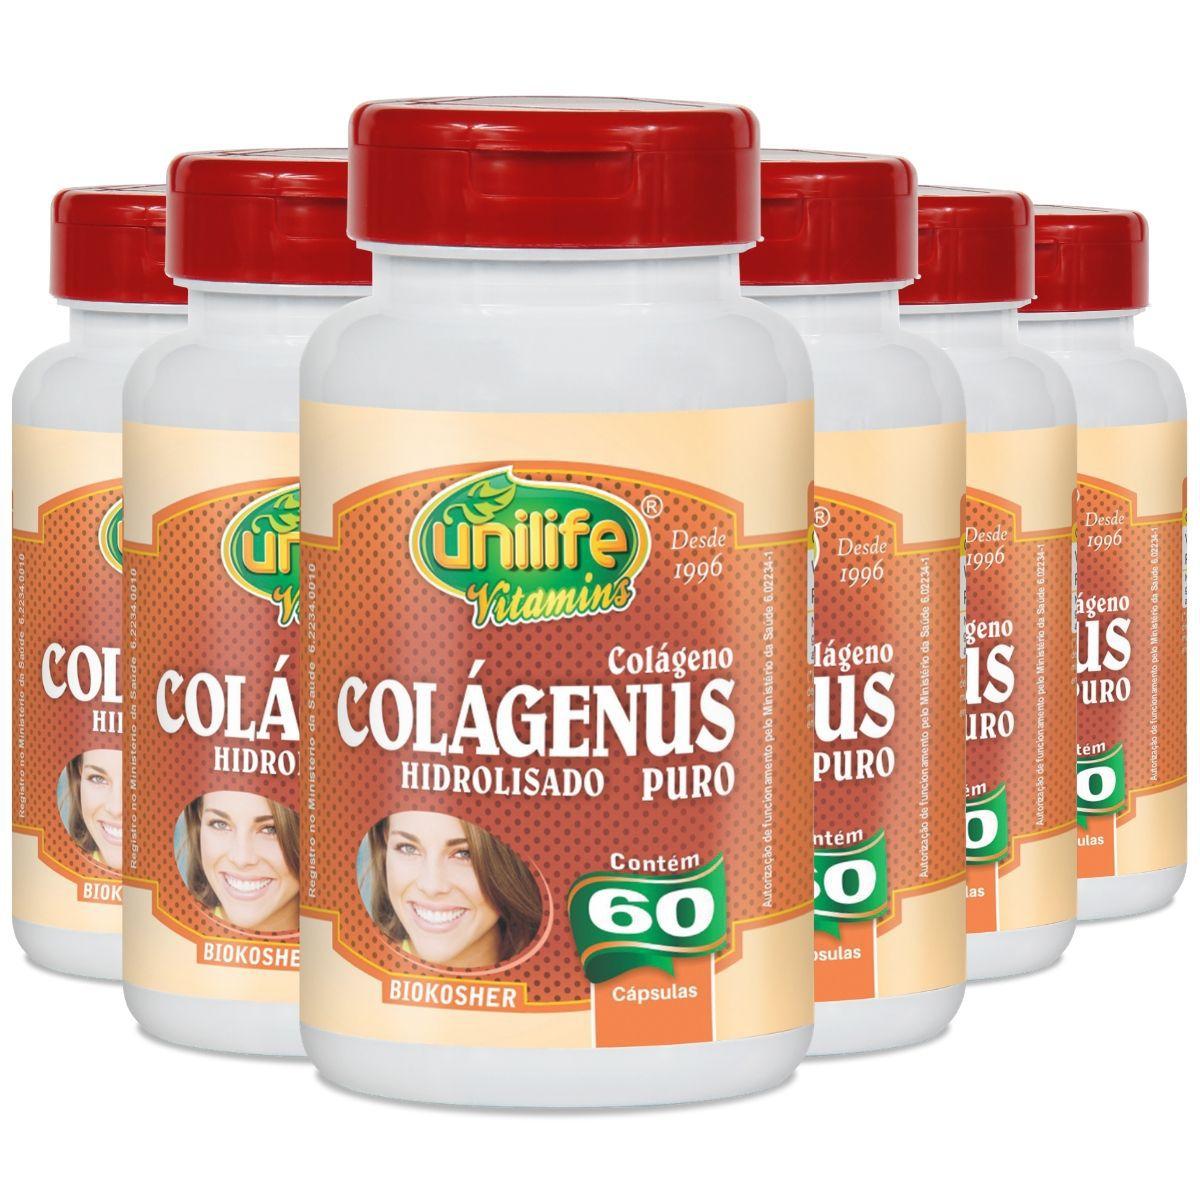 Kit 6 Colágeno Hidrolisado Puro 450mg 60 capsulas - Unilife